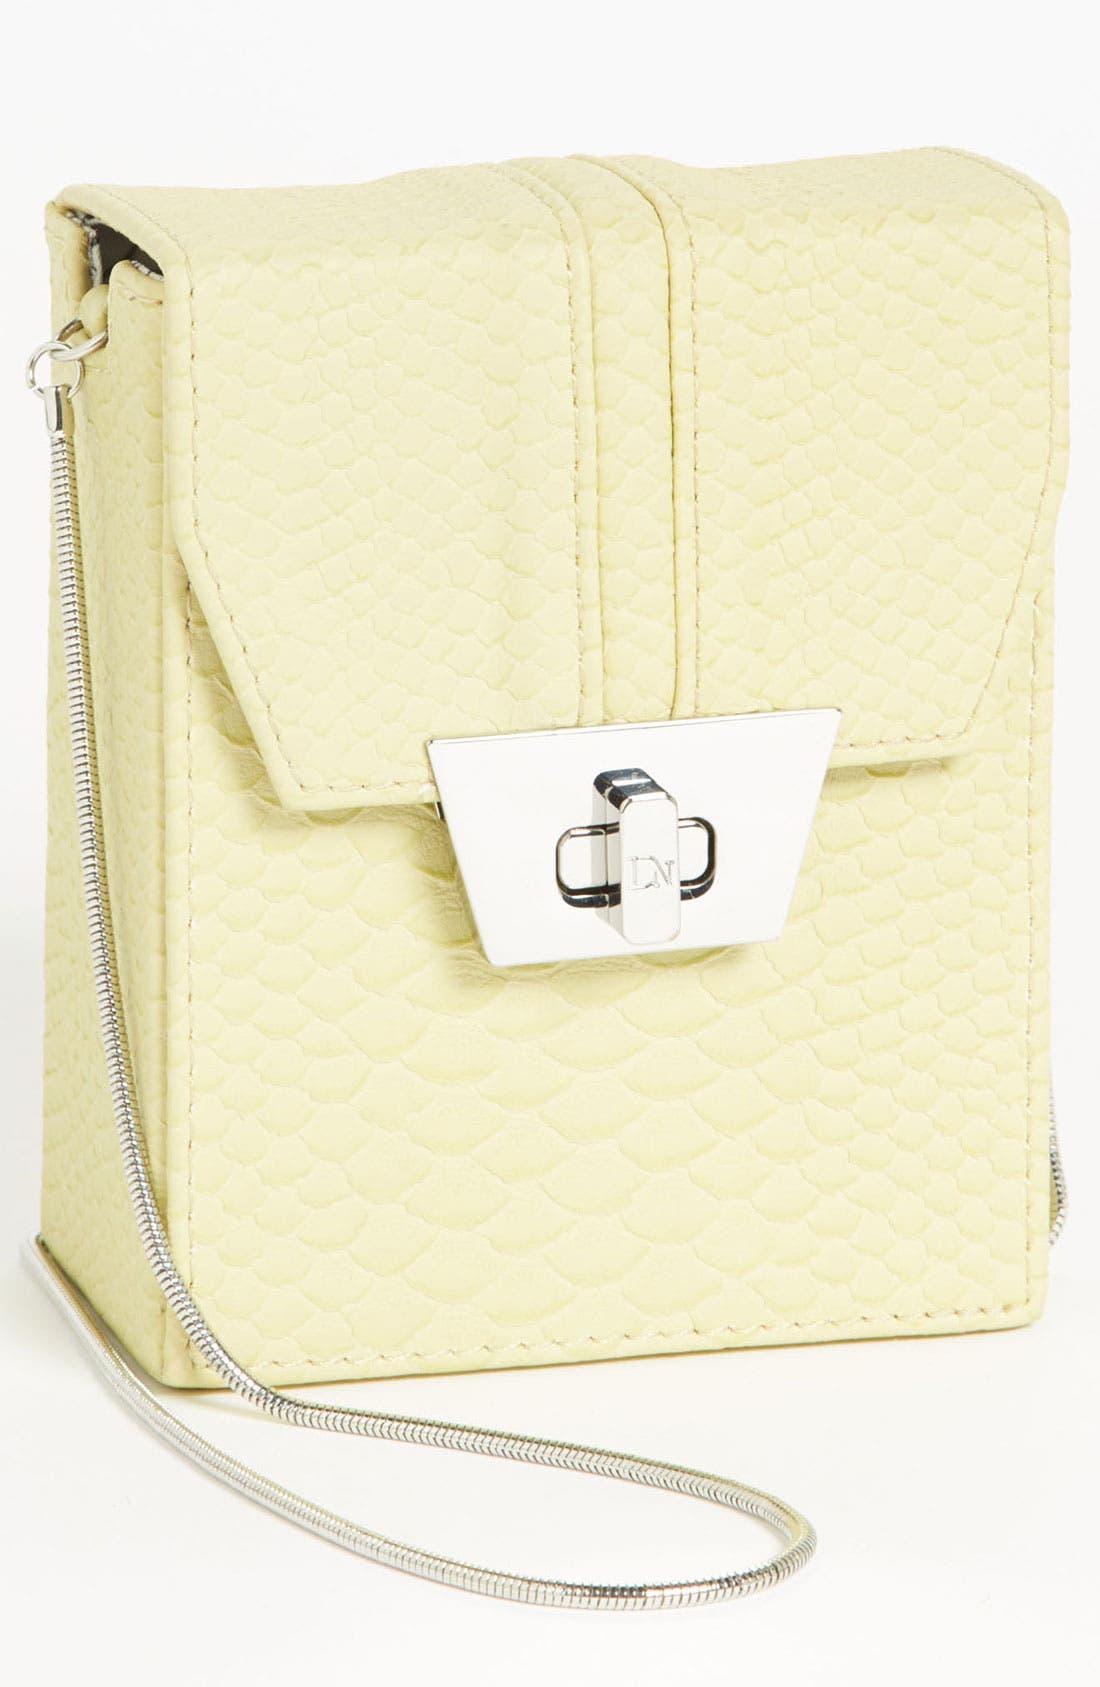 Alternate Image 1 Selected - Danielle Nicole 'Remi' Crossbody Bag